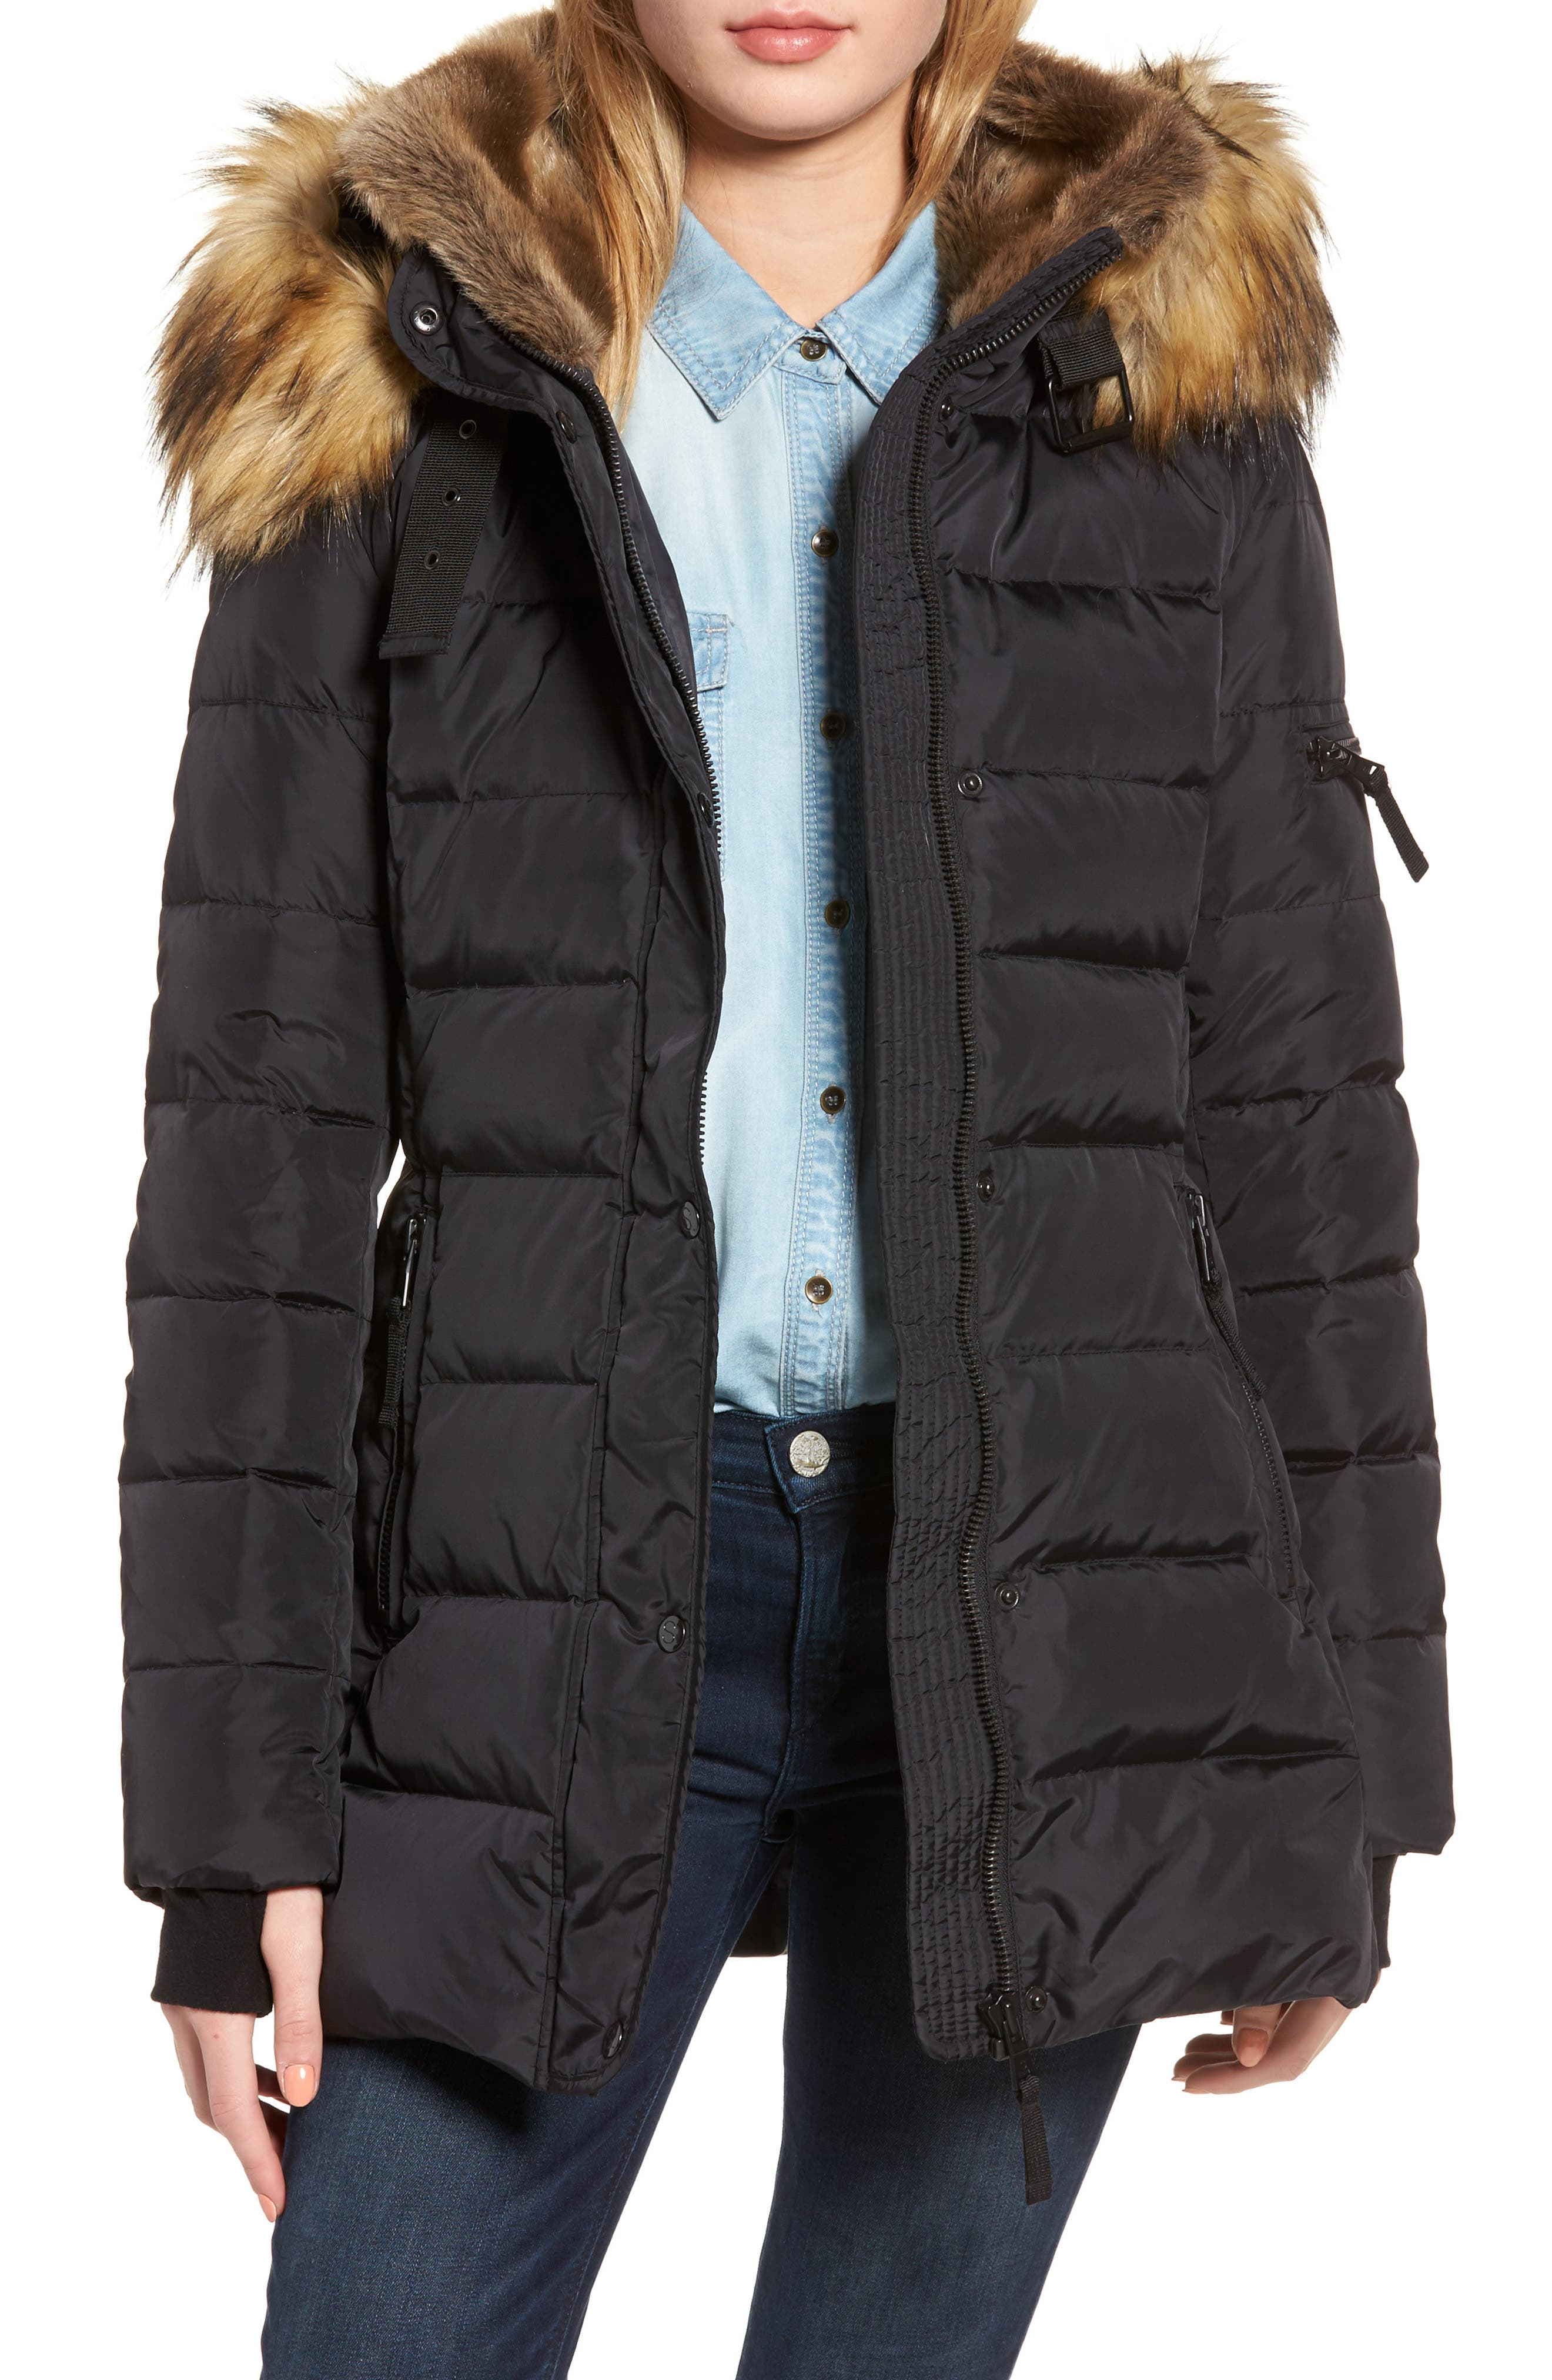 S13 Faux Fur Hooded Coat,                         Main,                         color, Black